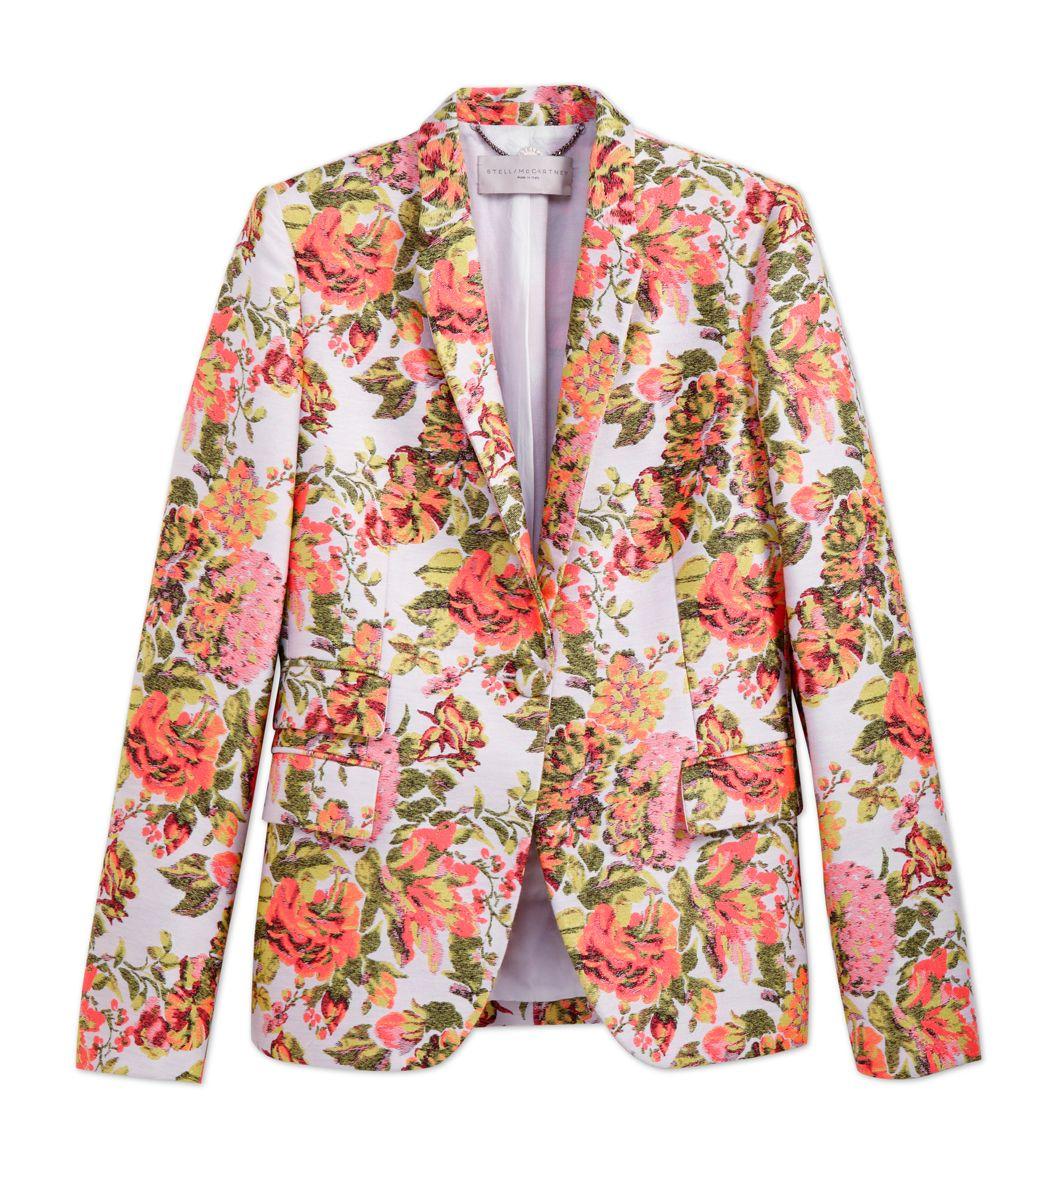 Stella mccartney floral jacquard jacket style pinterest